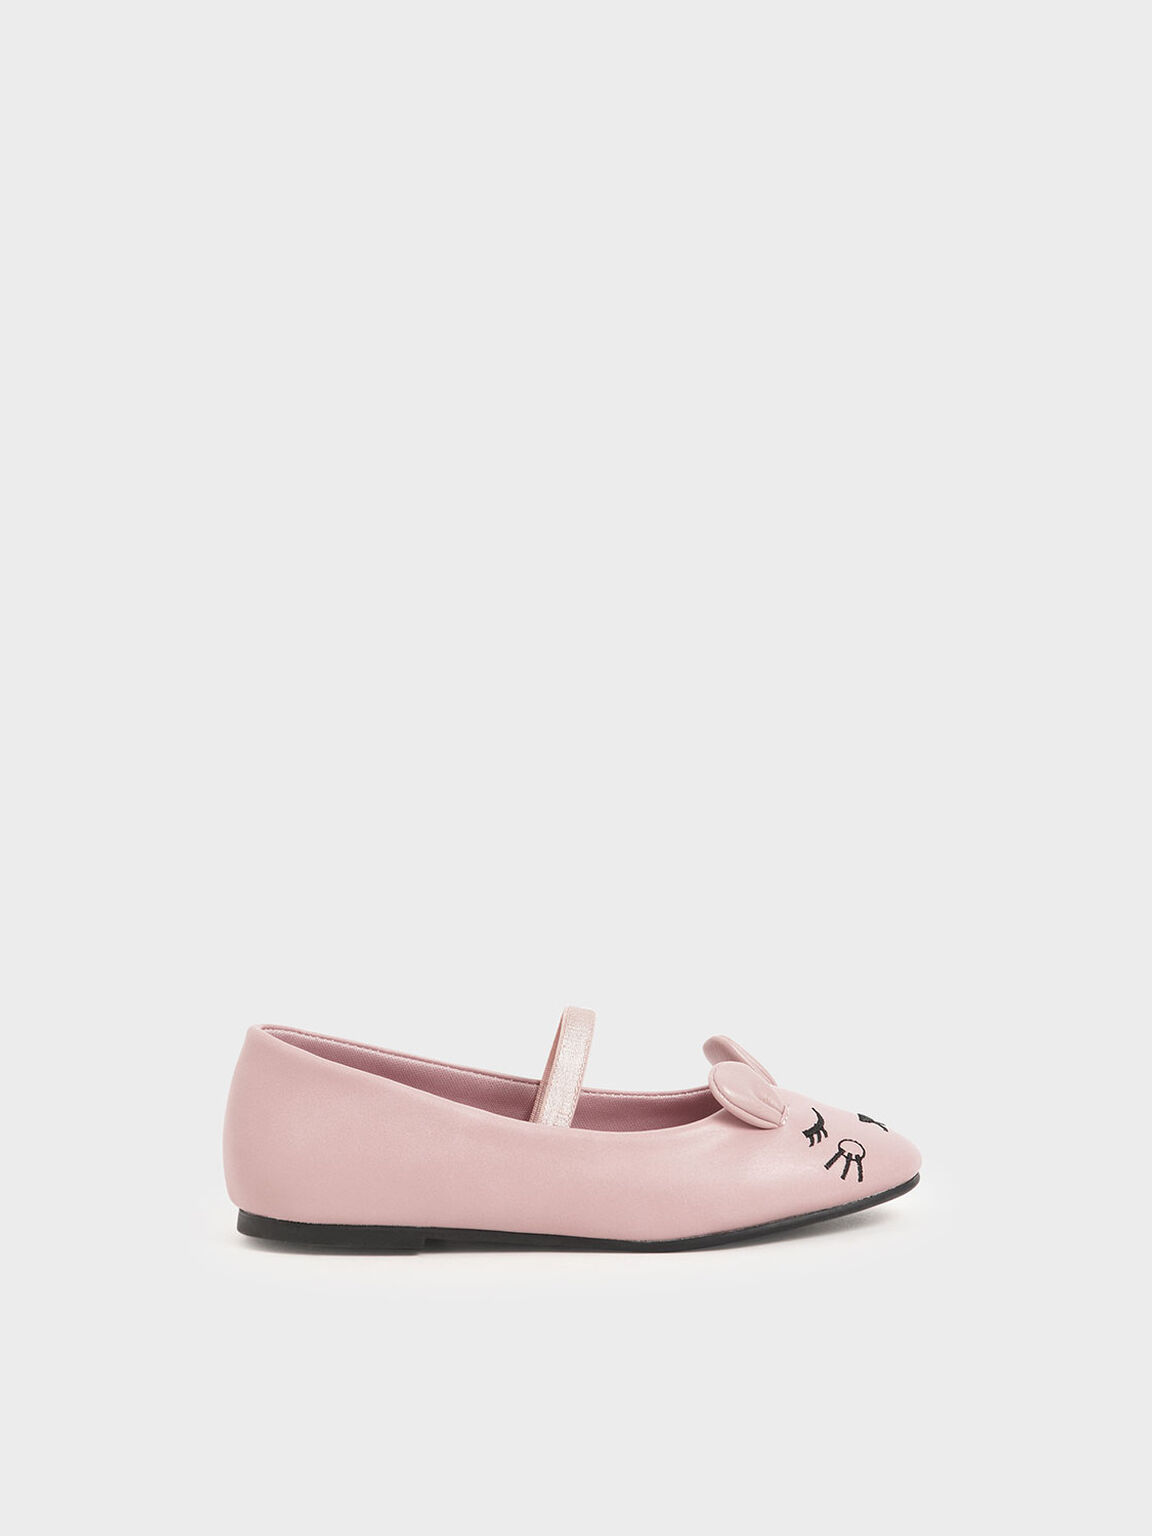 Girls' 'Rat Zodiac' Mary Jane Flats, Pink, hi-res